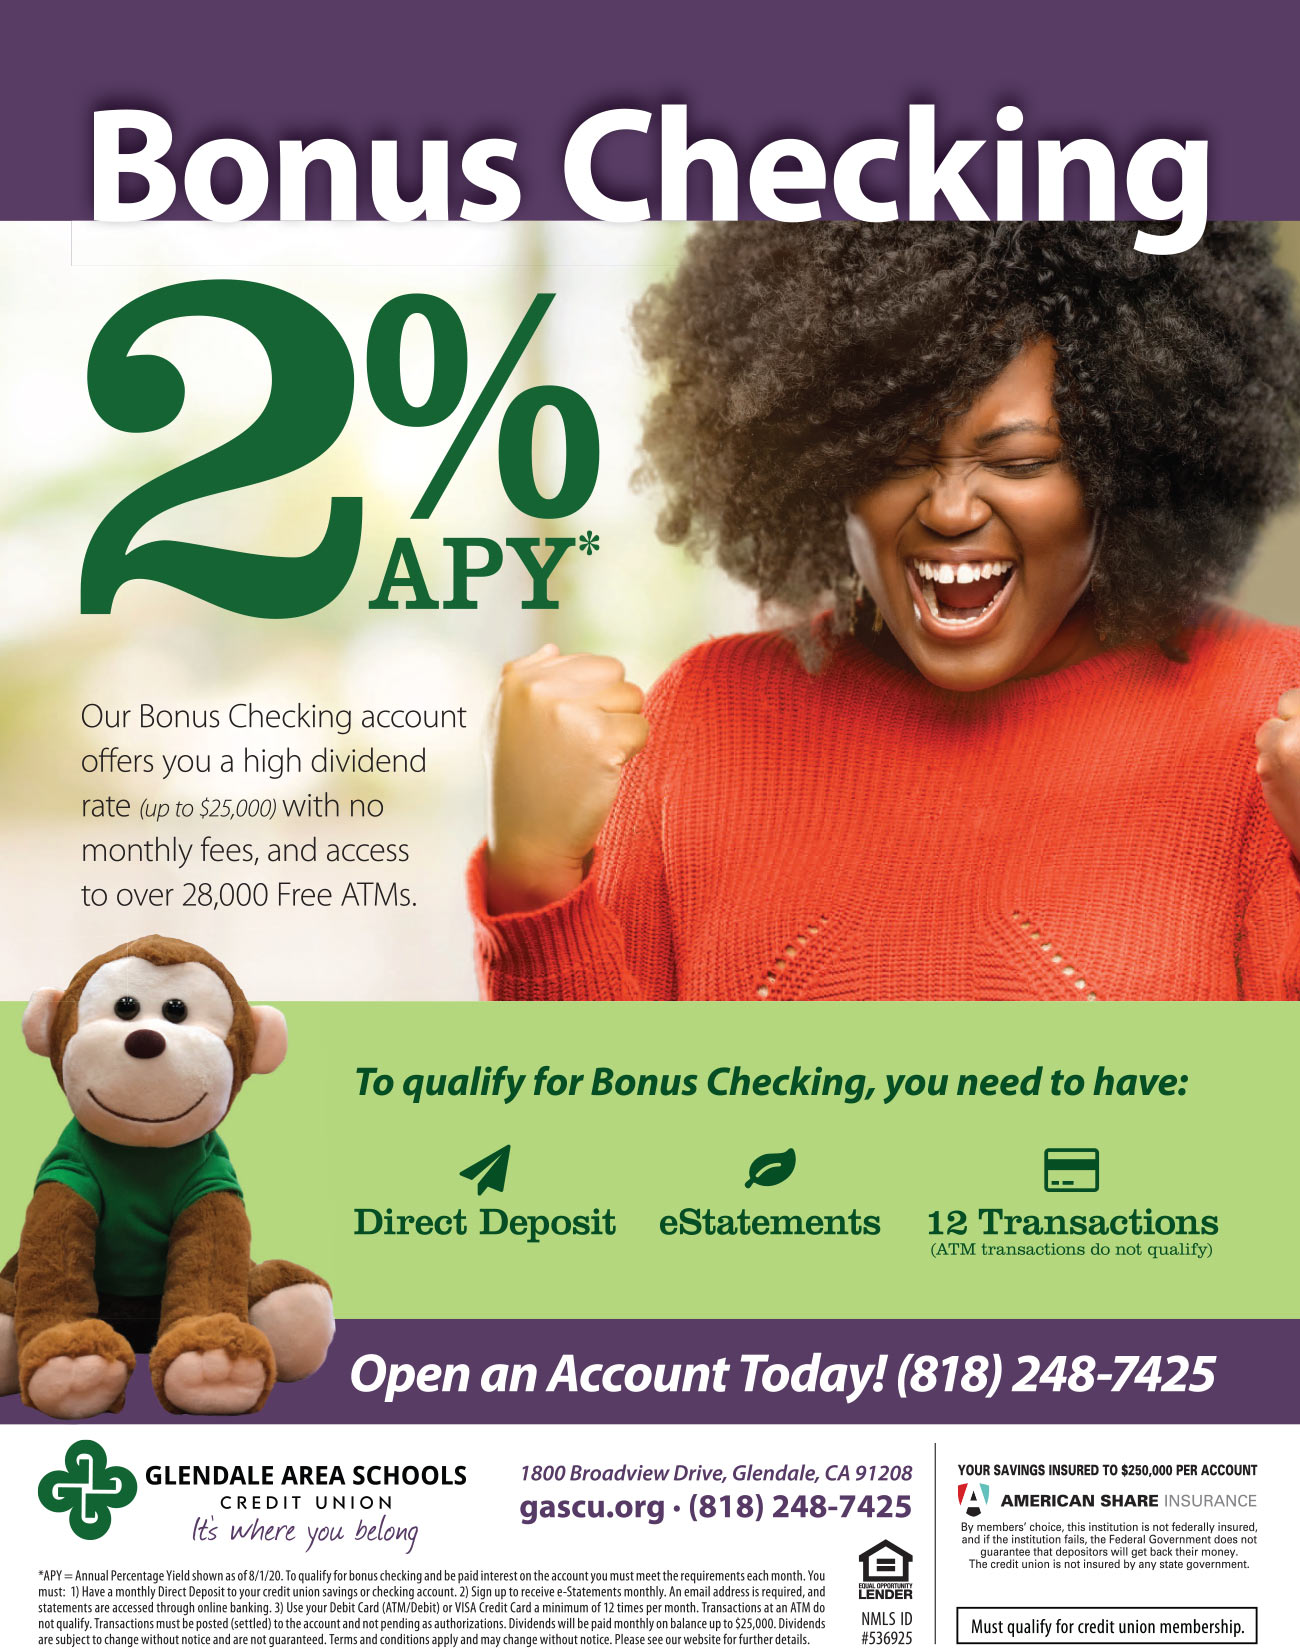 Bonus Checking